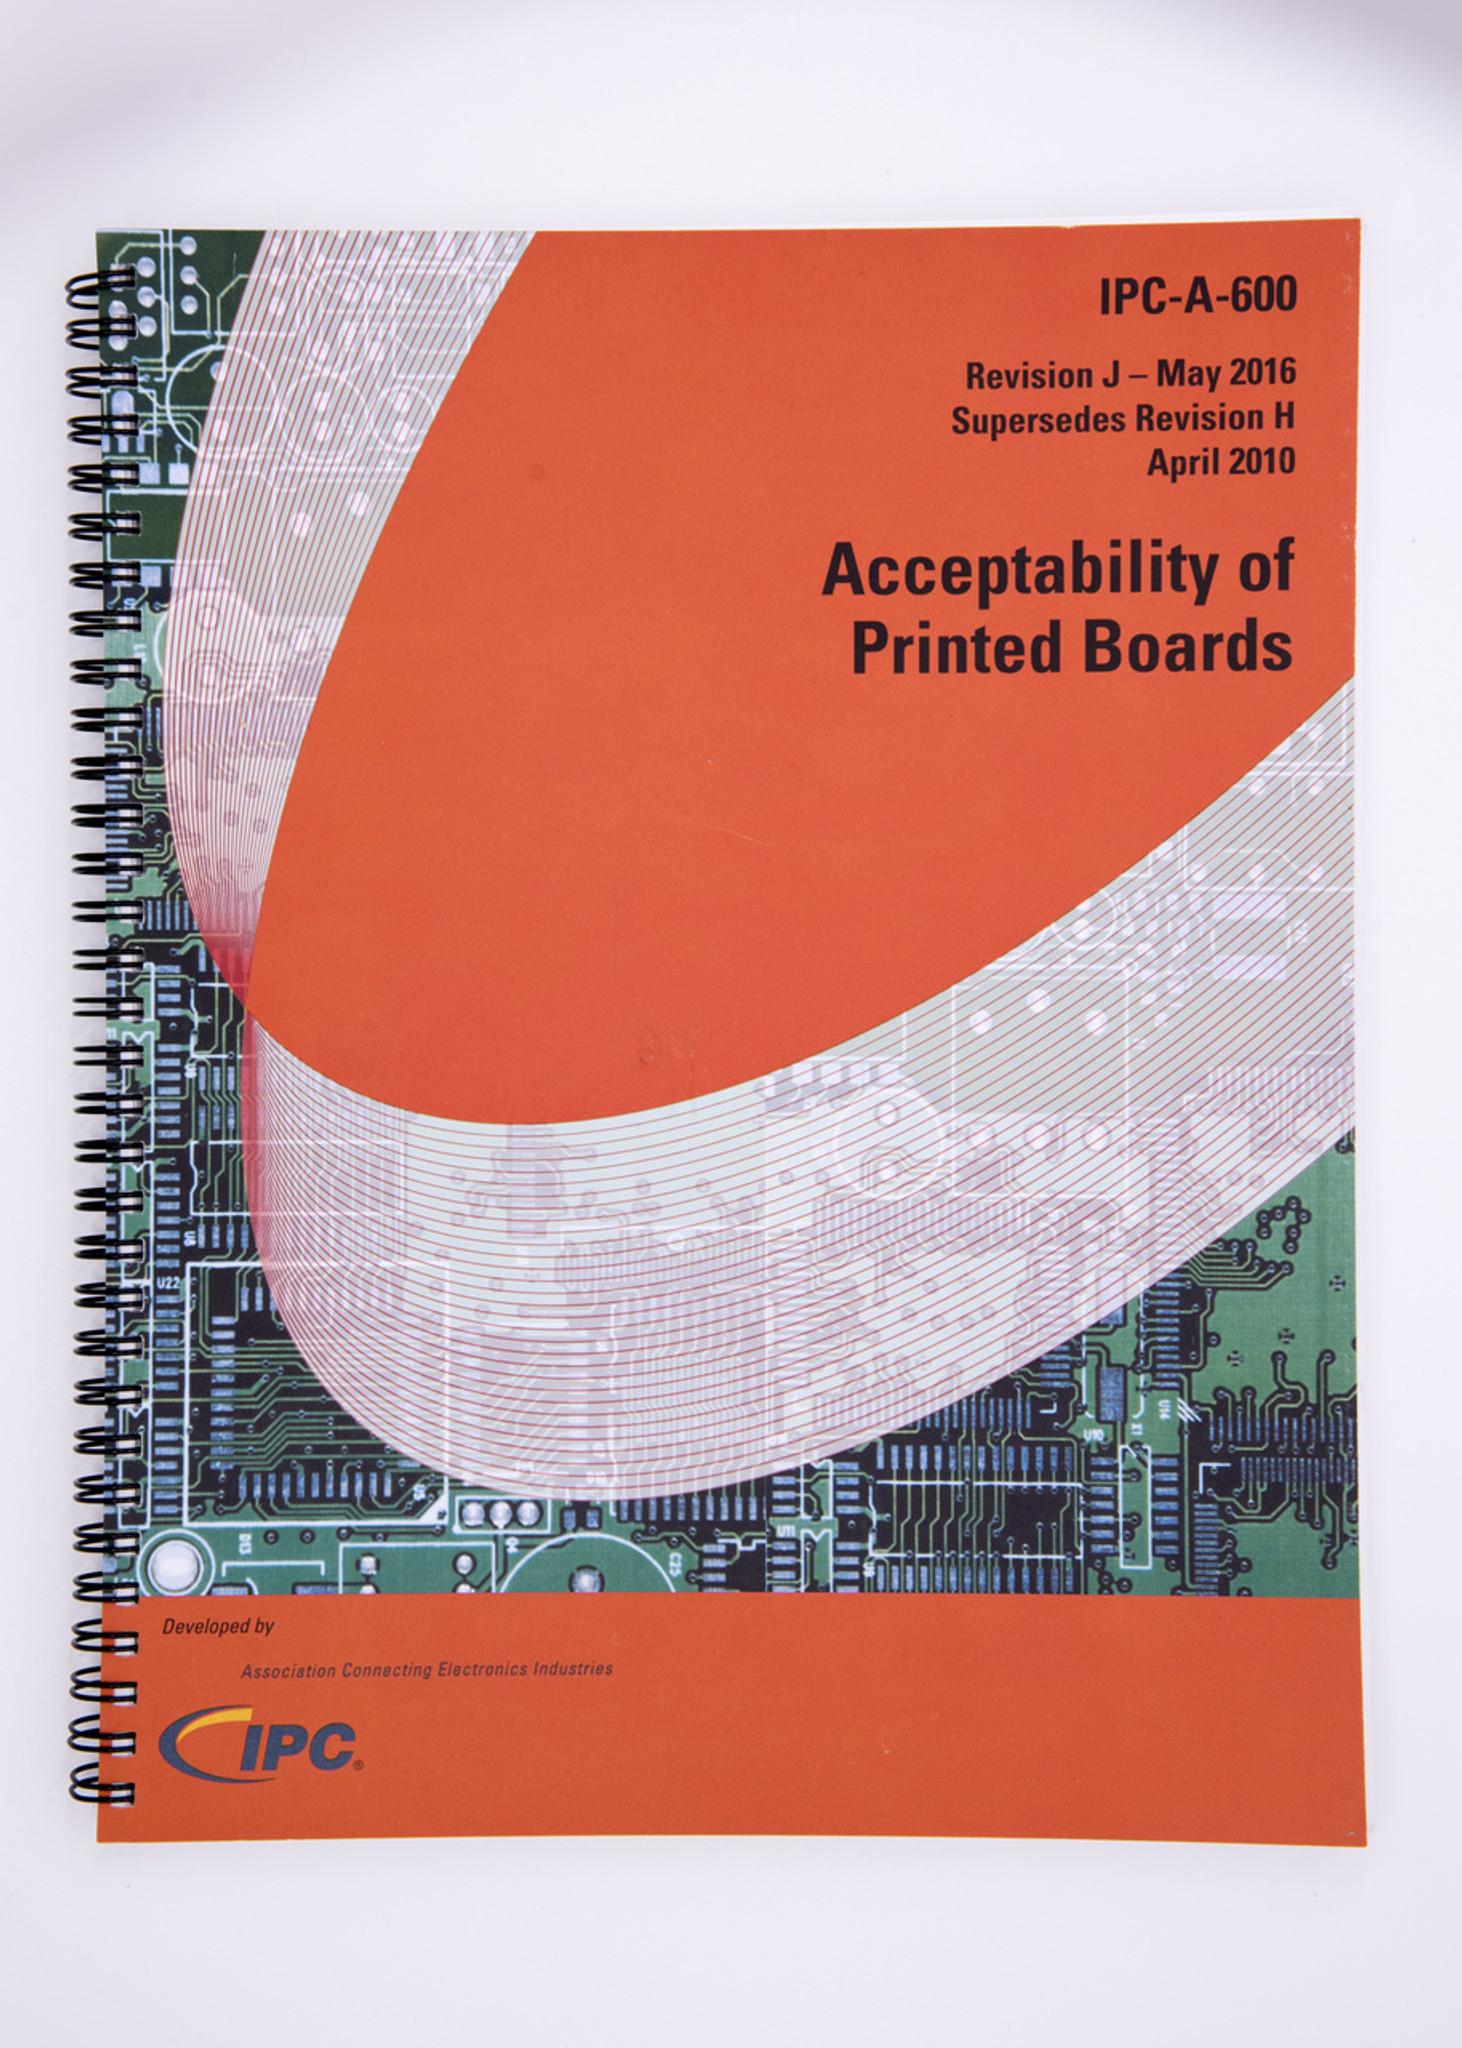 IPC-A-600J Standard (Revision J)